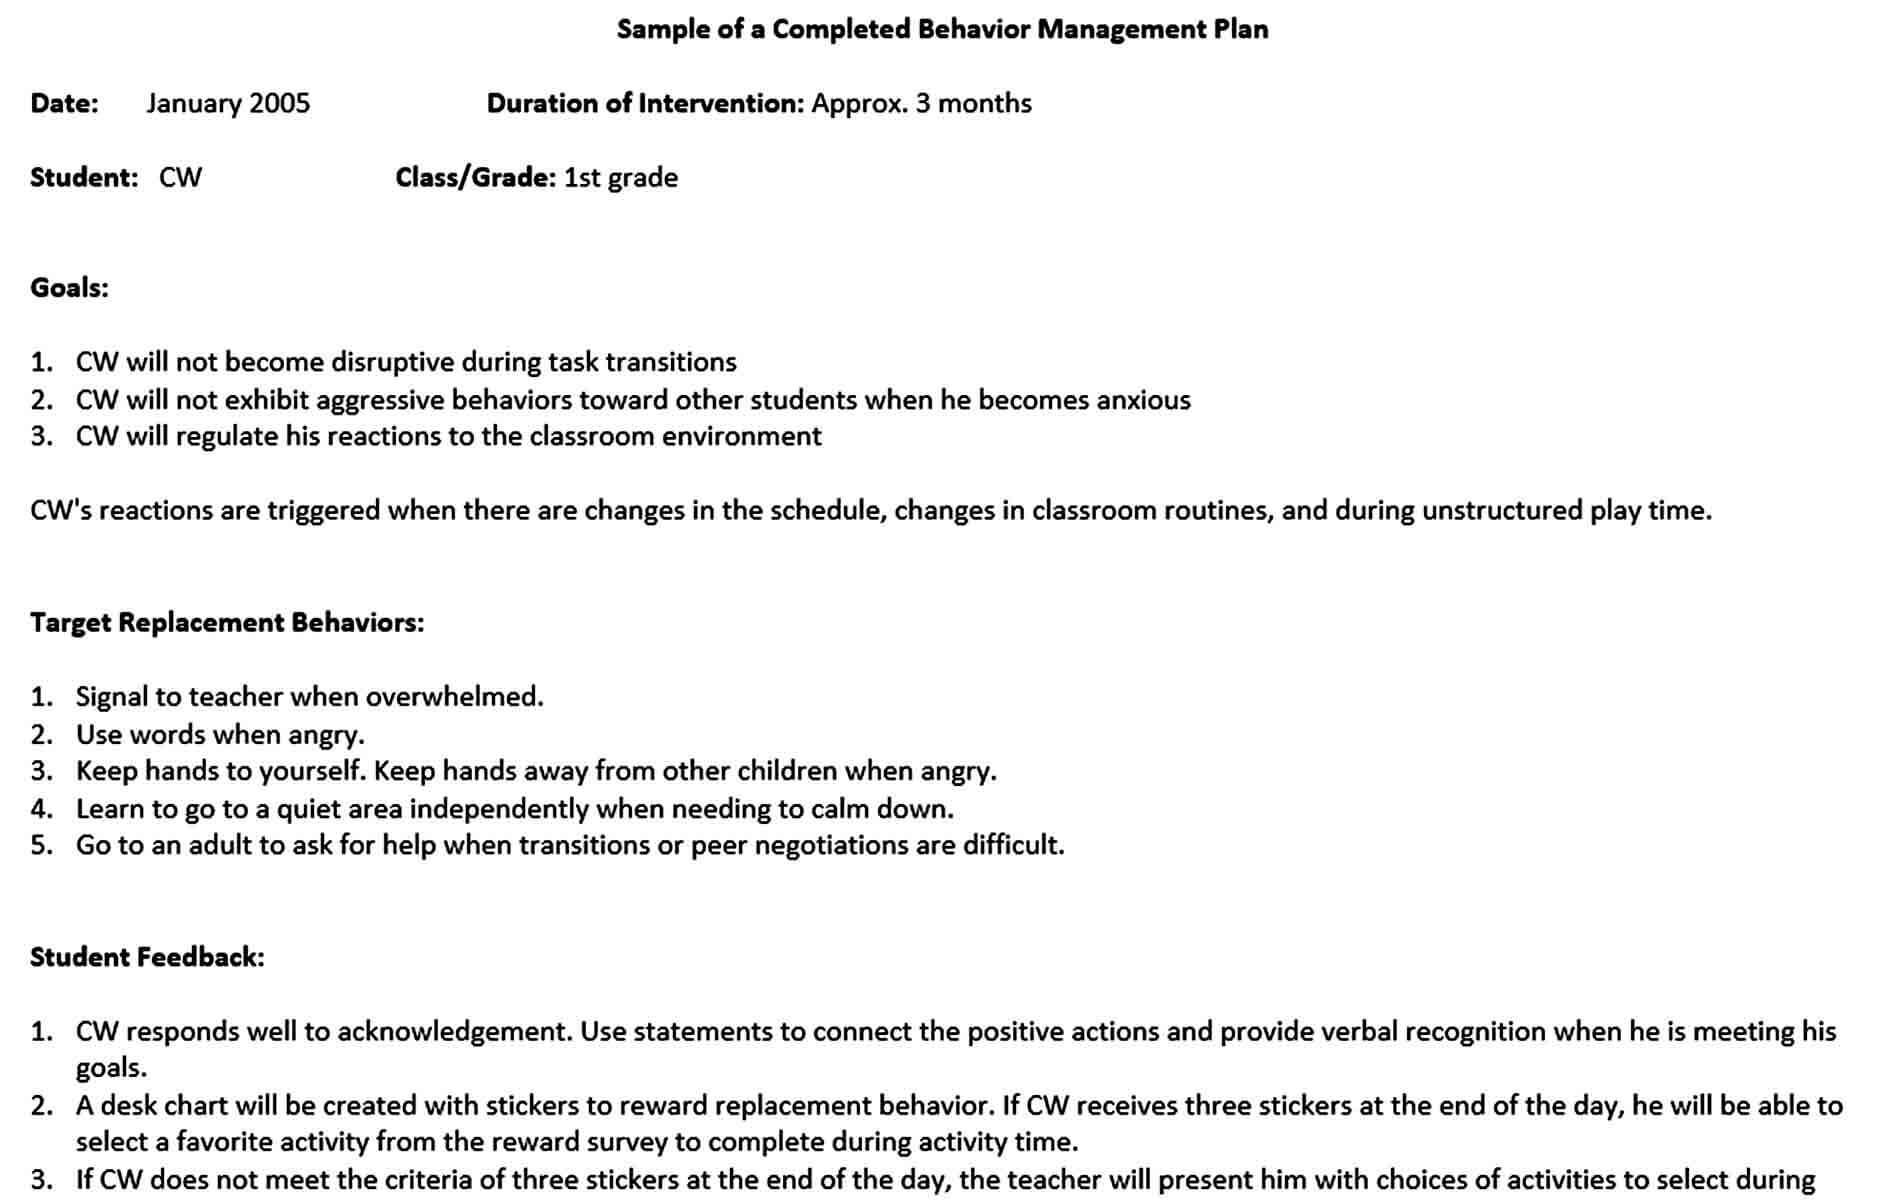 Templates sample managemen